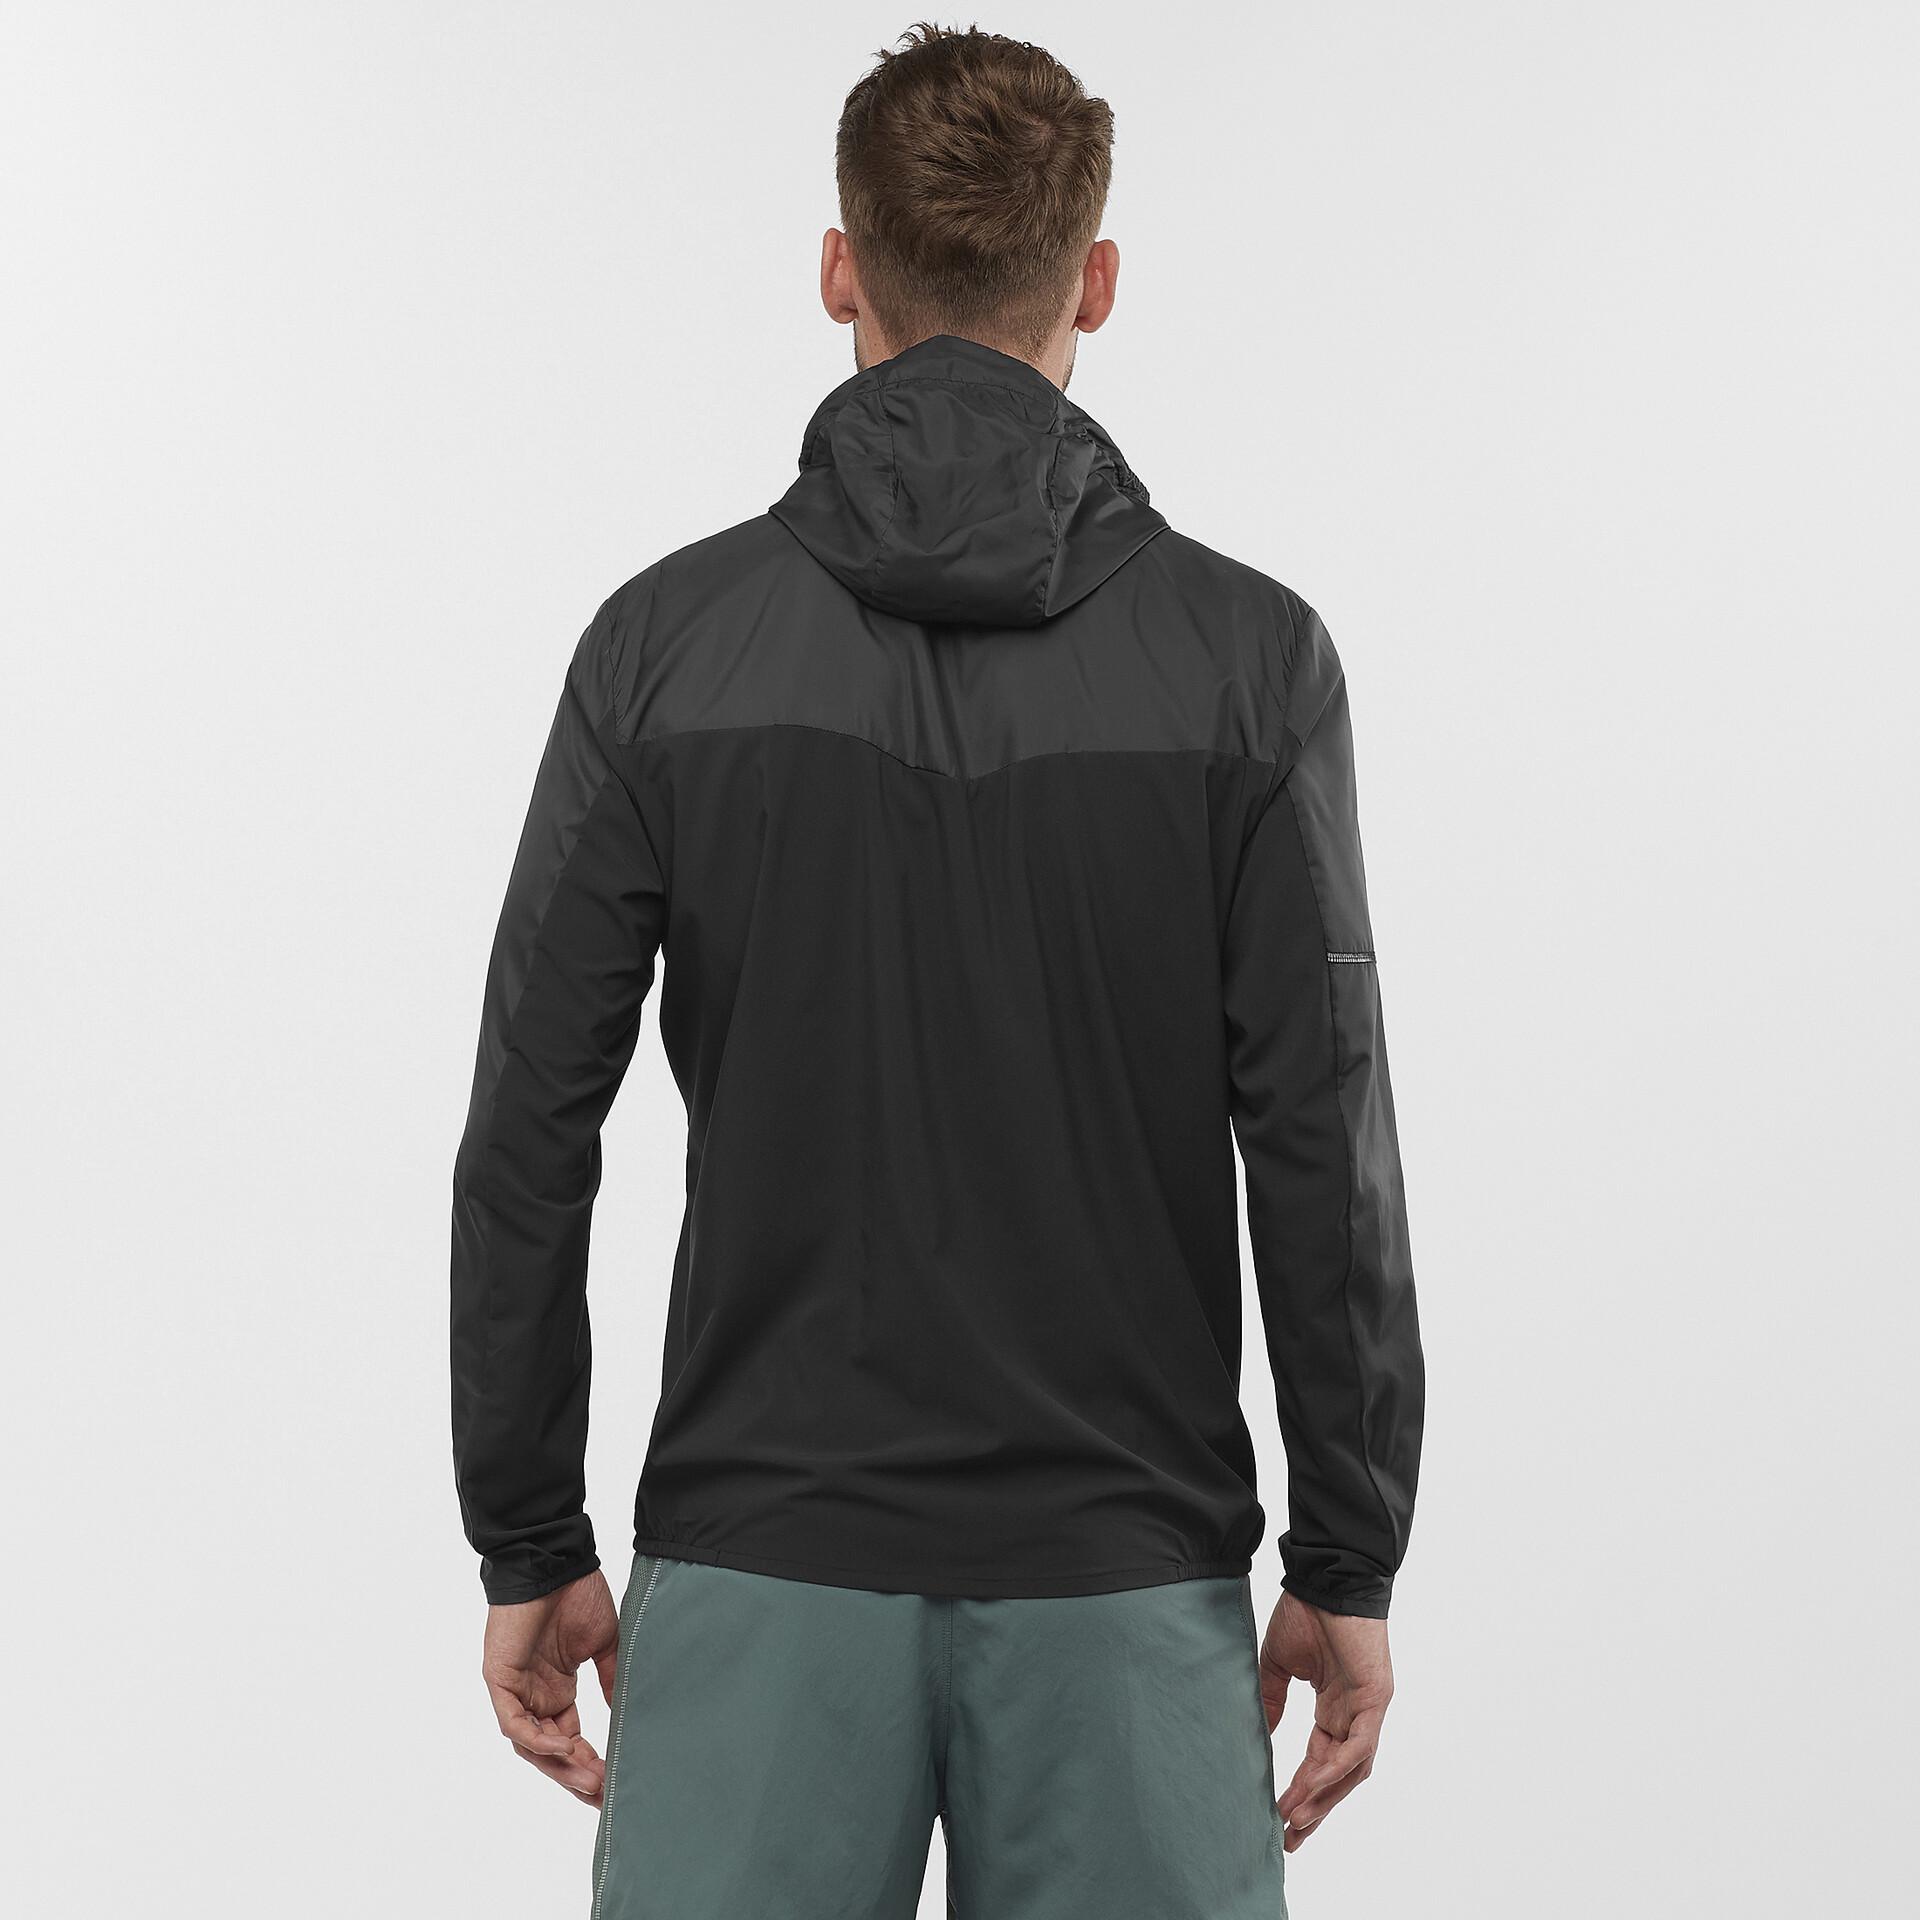 Eaze FZ Sweat Hood Jacket M Black